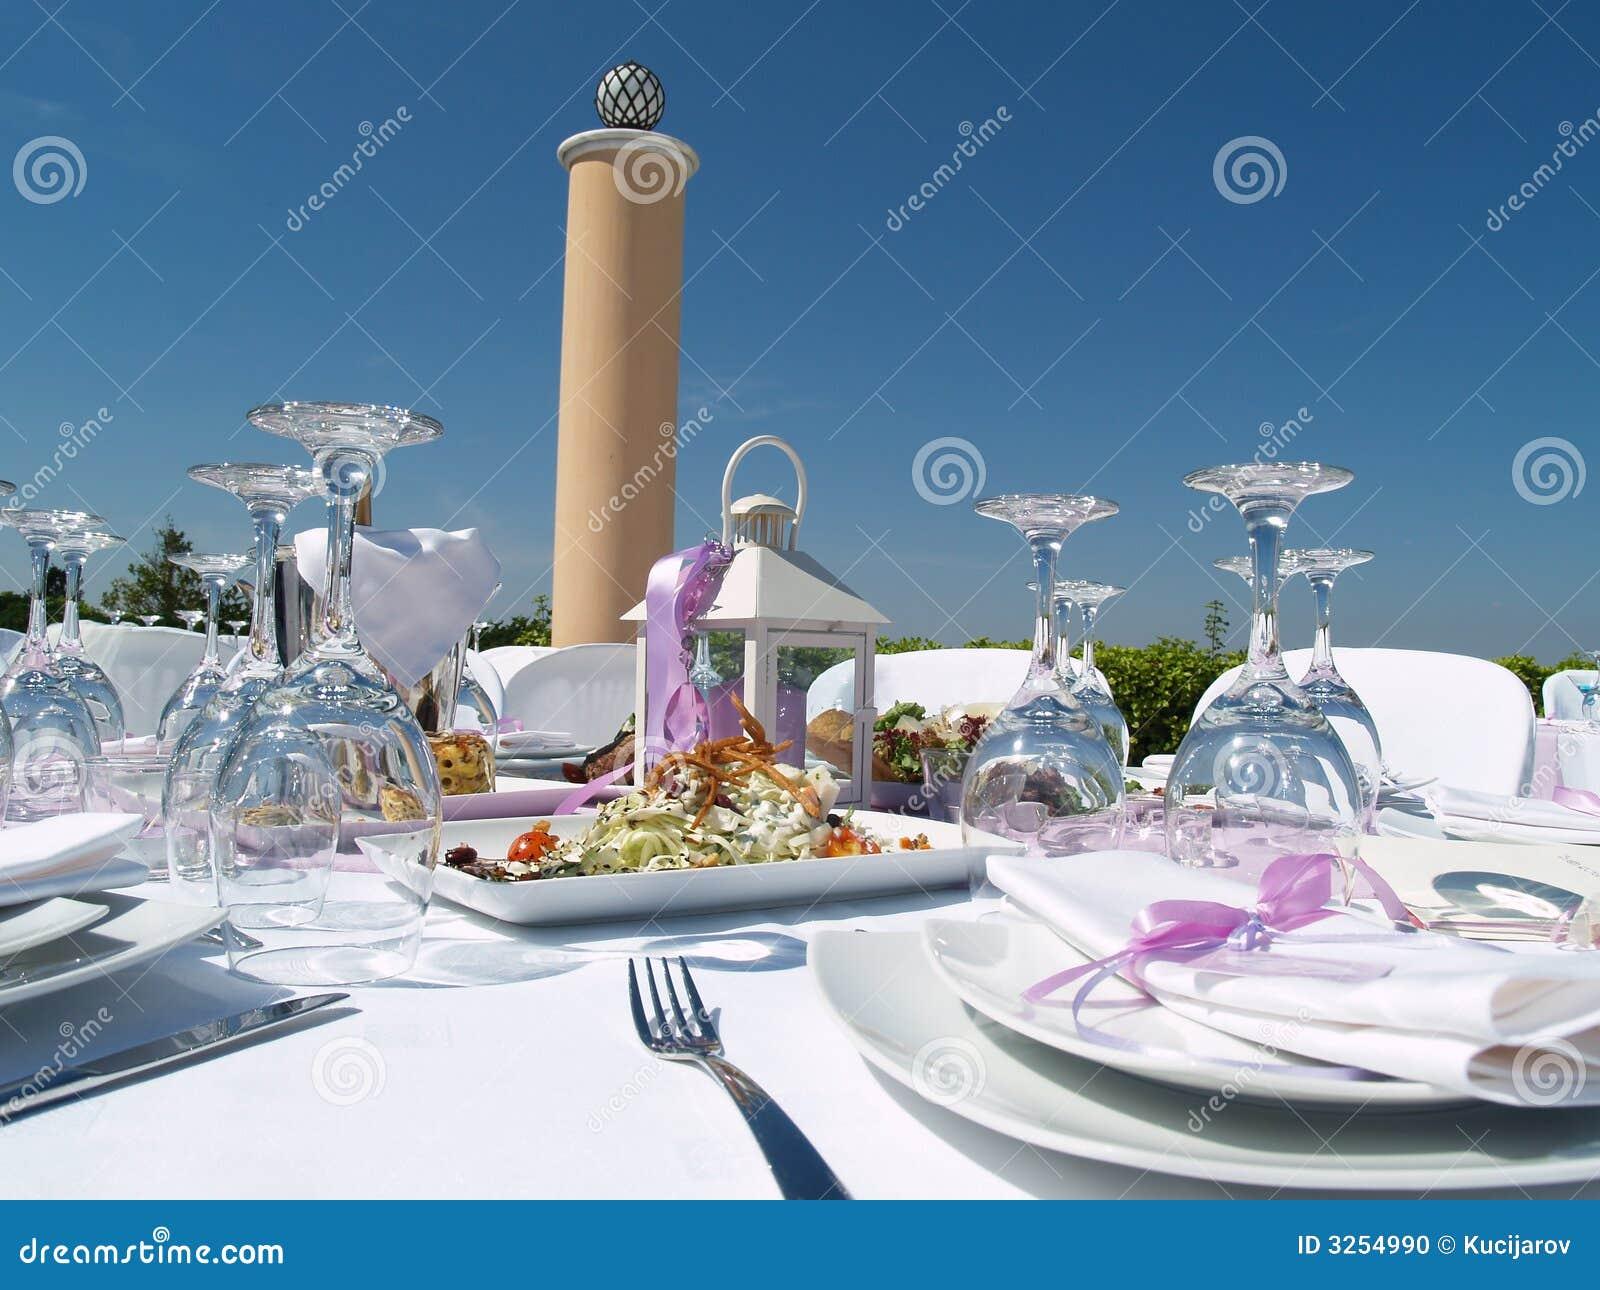 Elegant Outdoor Table Setting Stock Photo Image 3254990